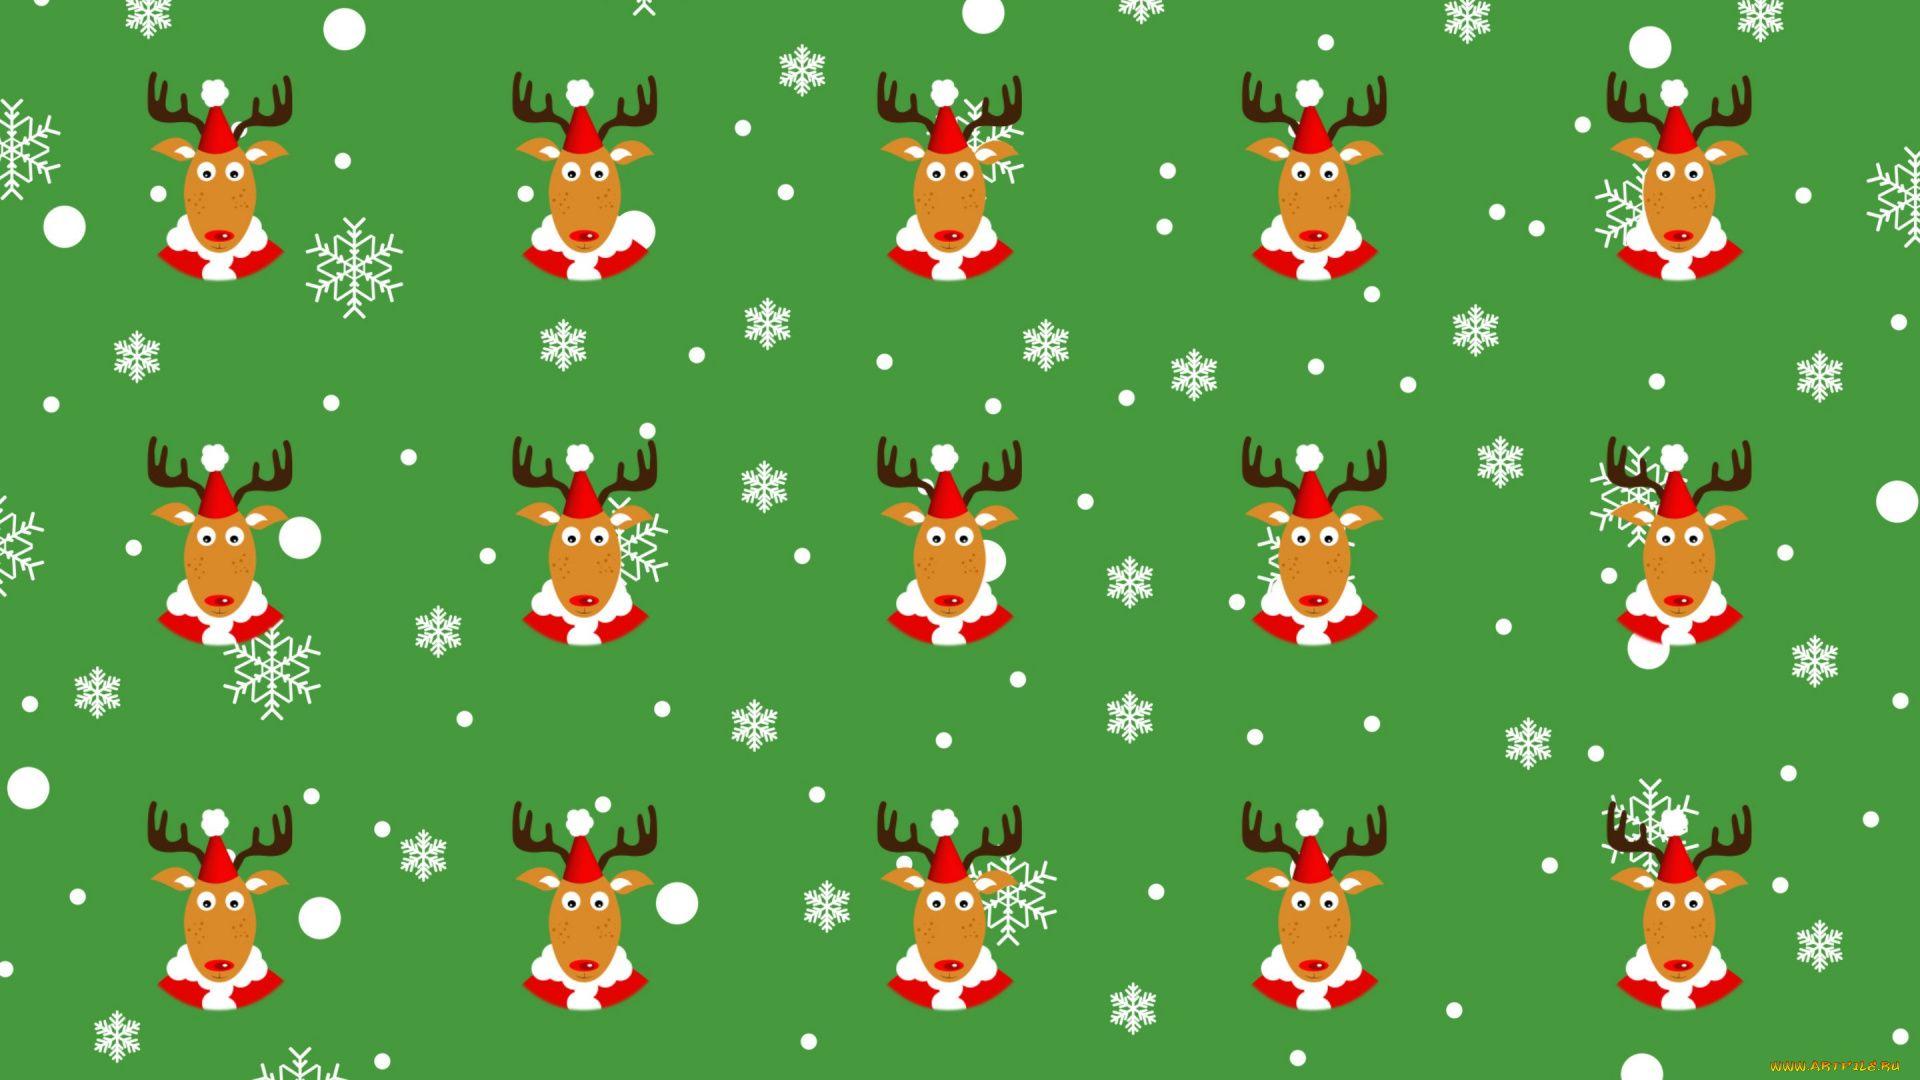 Christmas Scrapbooking wallpaper theme